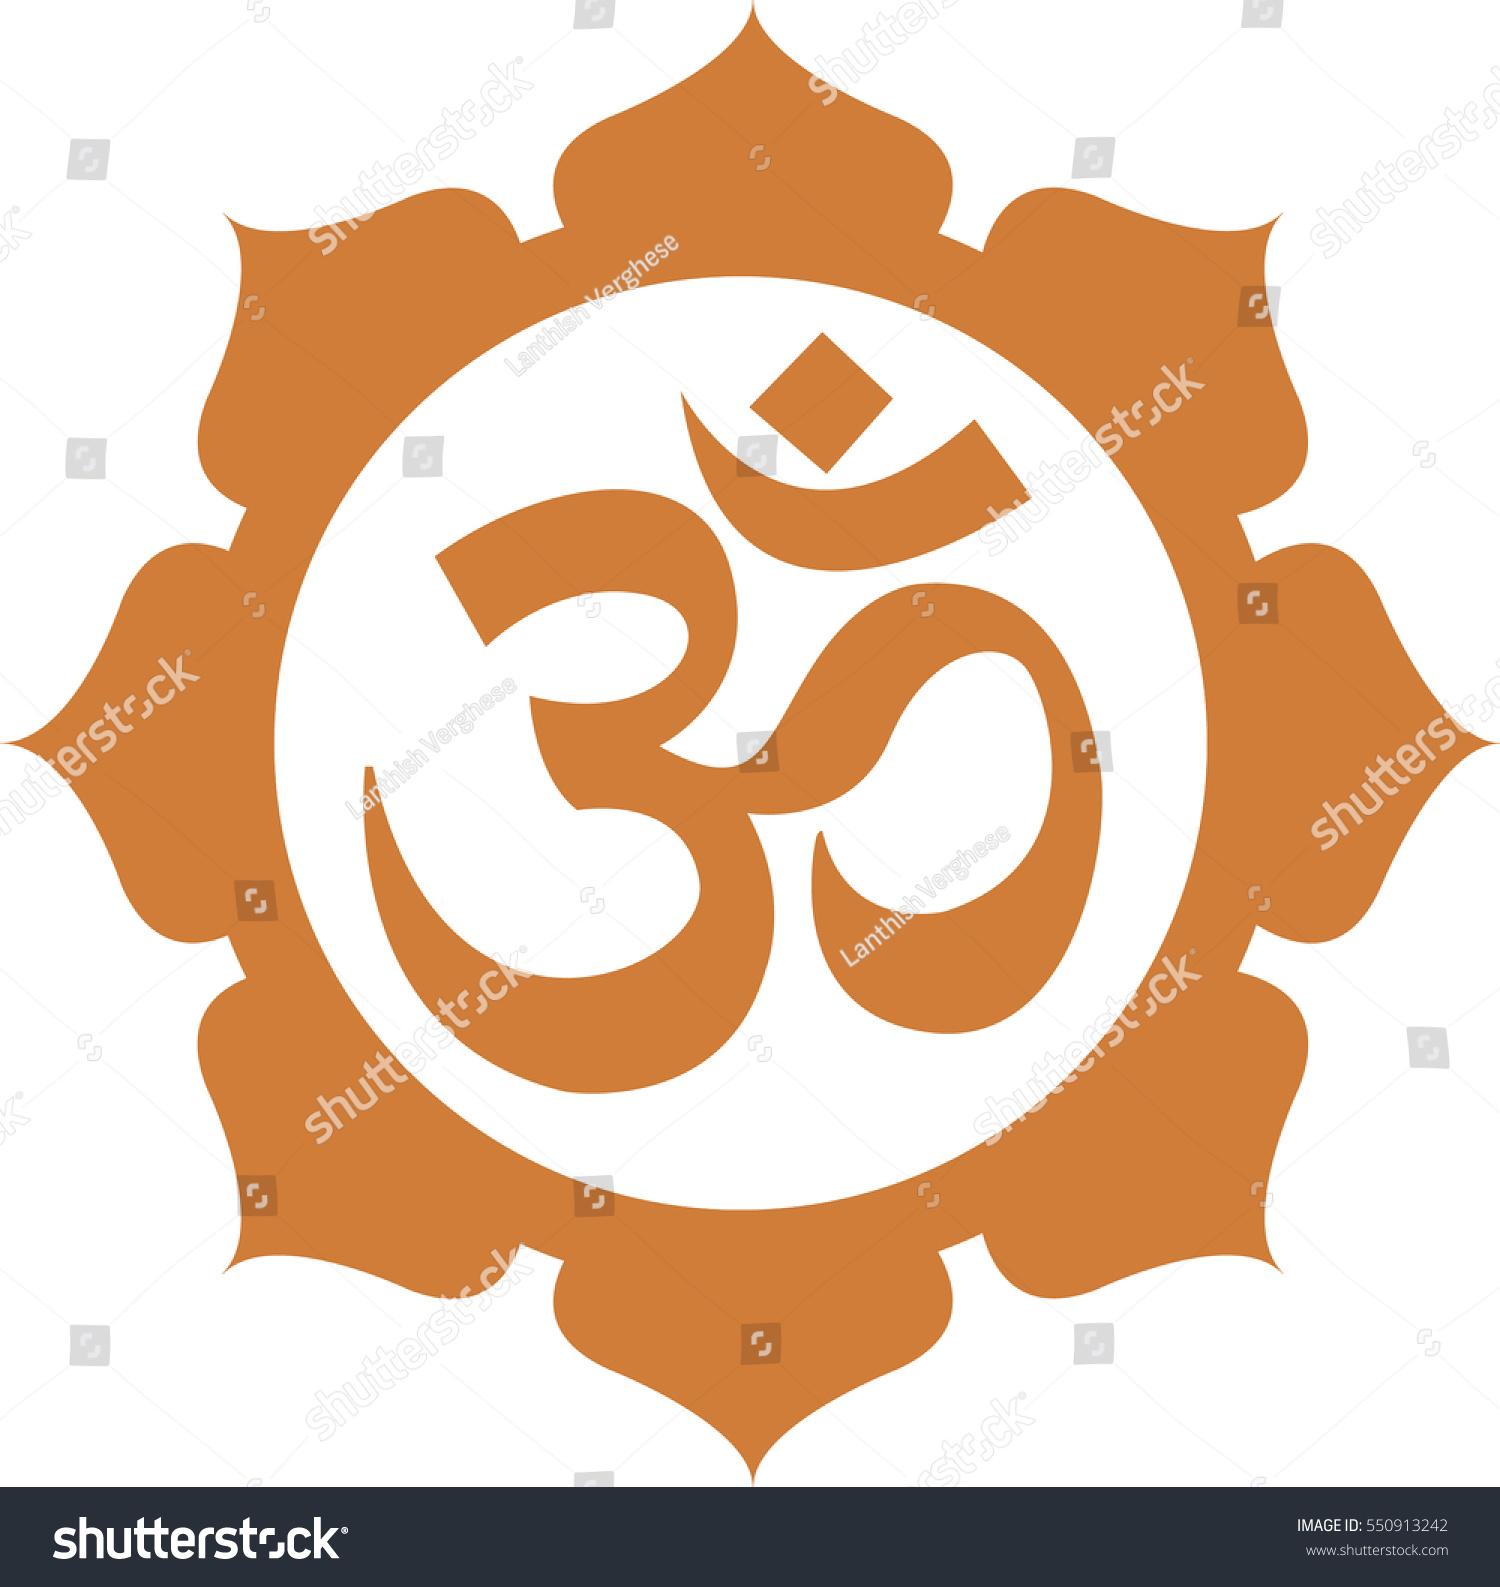 Hindu religious symbol om stock vector 550913242 shutterstock hindu religious symbol om biocorpaavc Choice Image